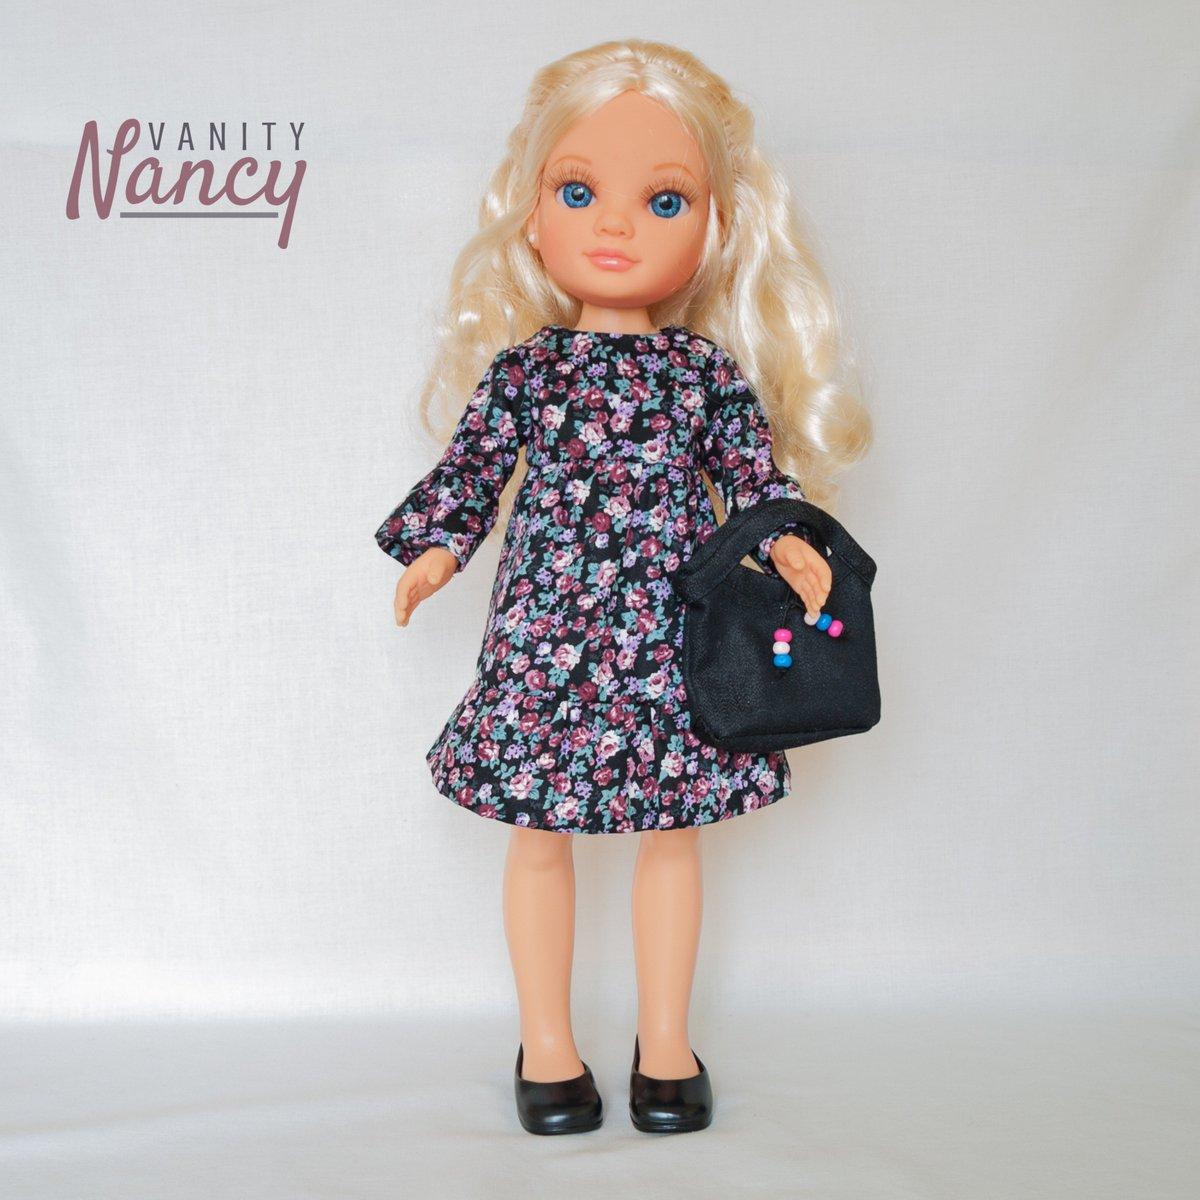 nancynew hashtag on Twitter